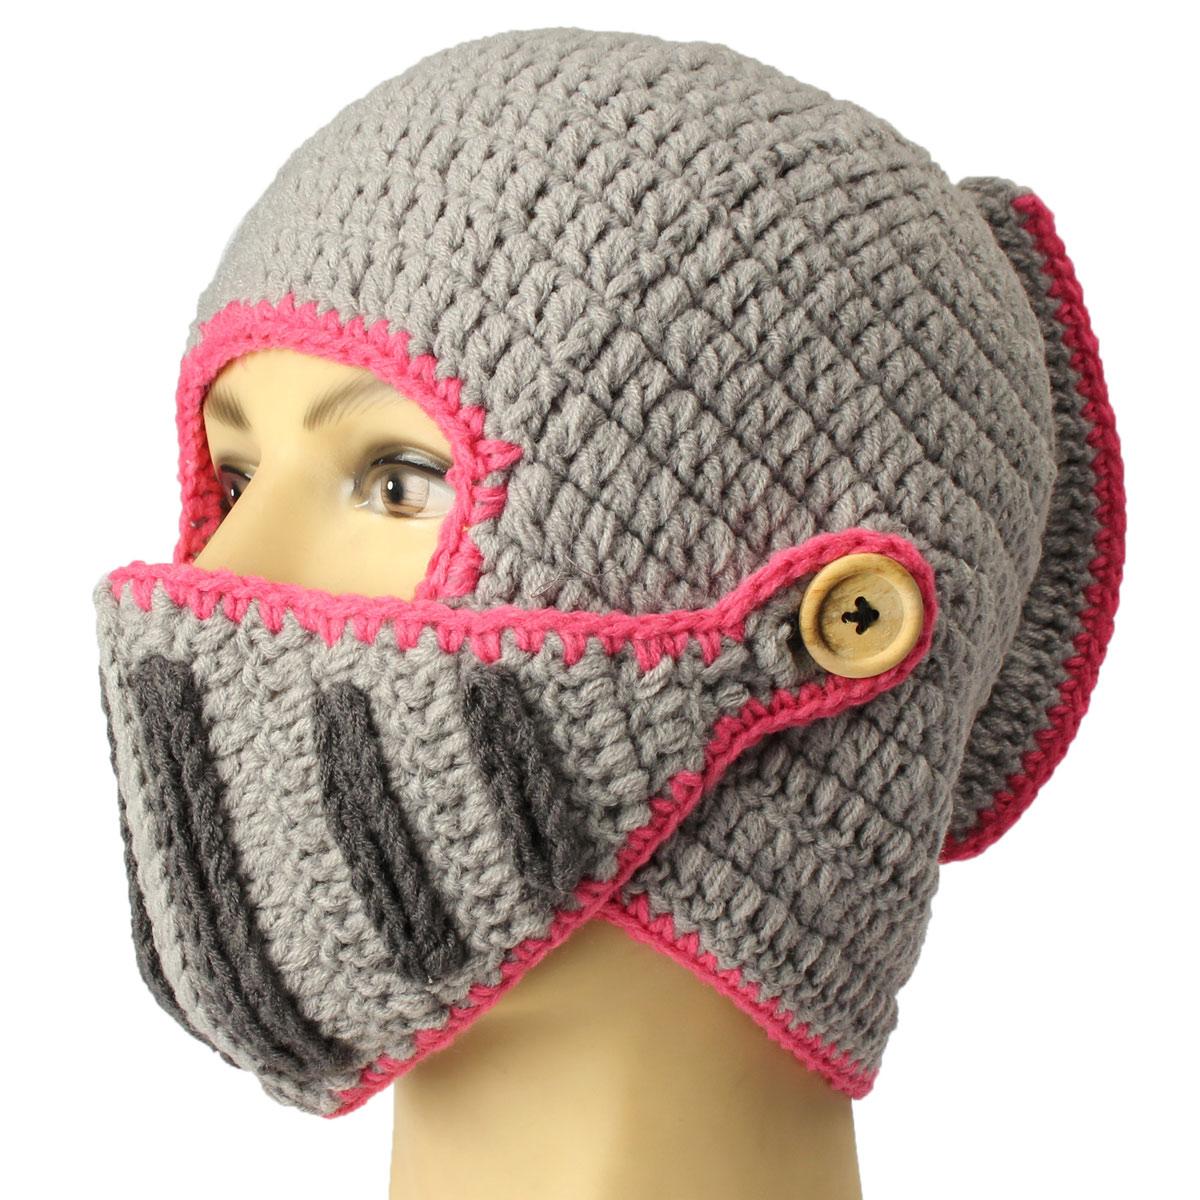 Unisex Men Knit Face Mask Beard Cap Crochet Ski Mustache Winter Warm